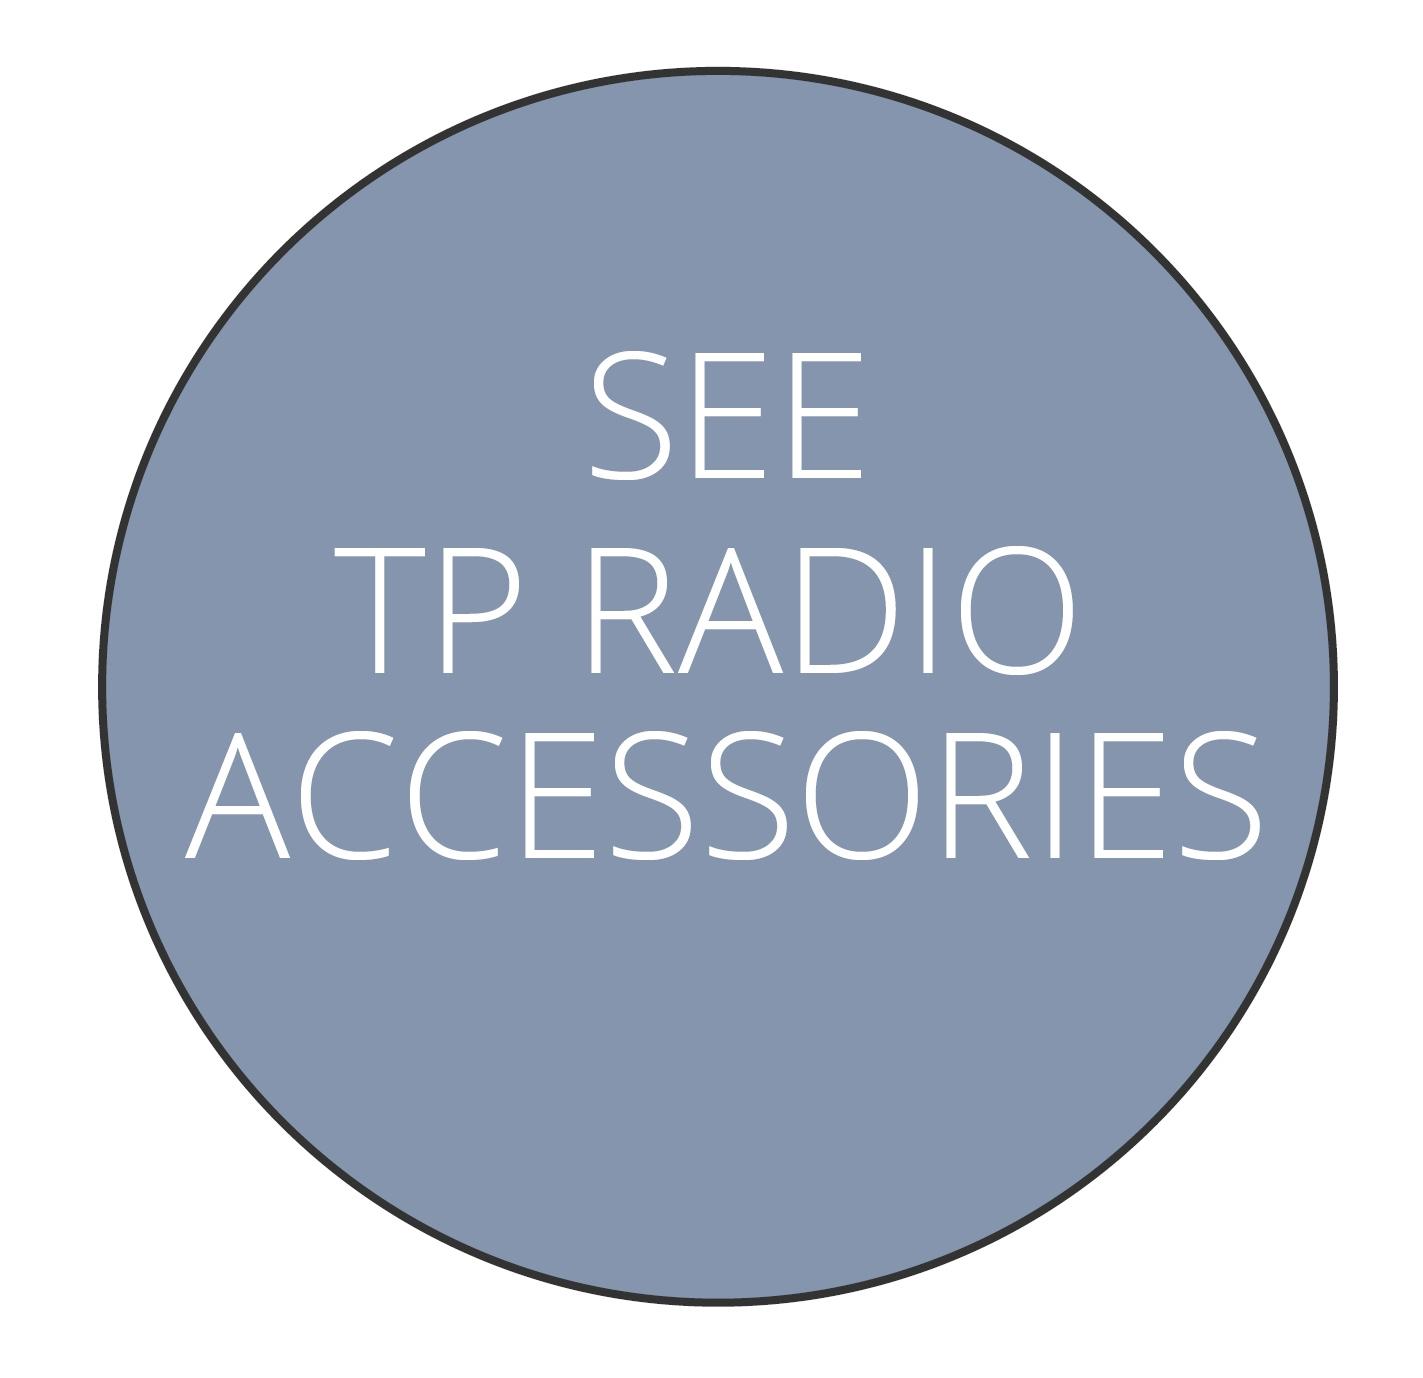 See TP Radio PMR accessories